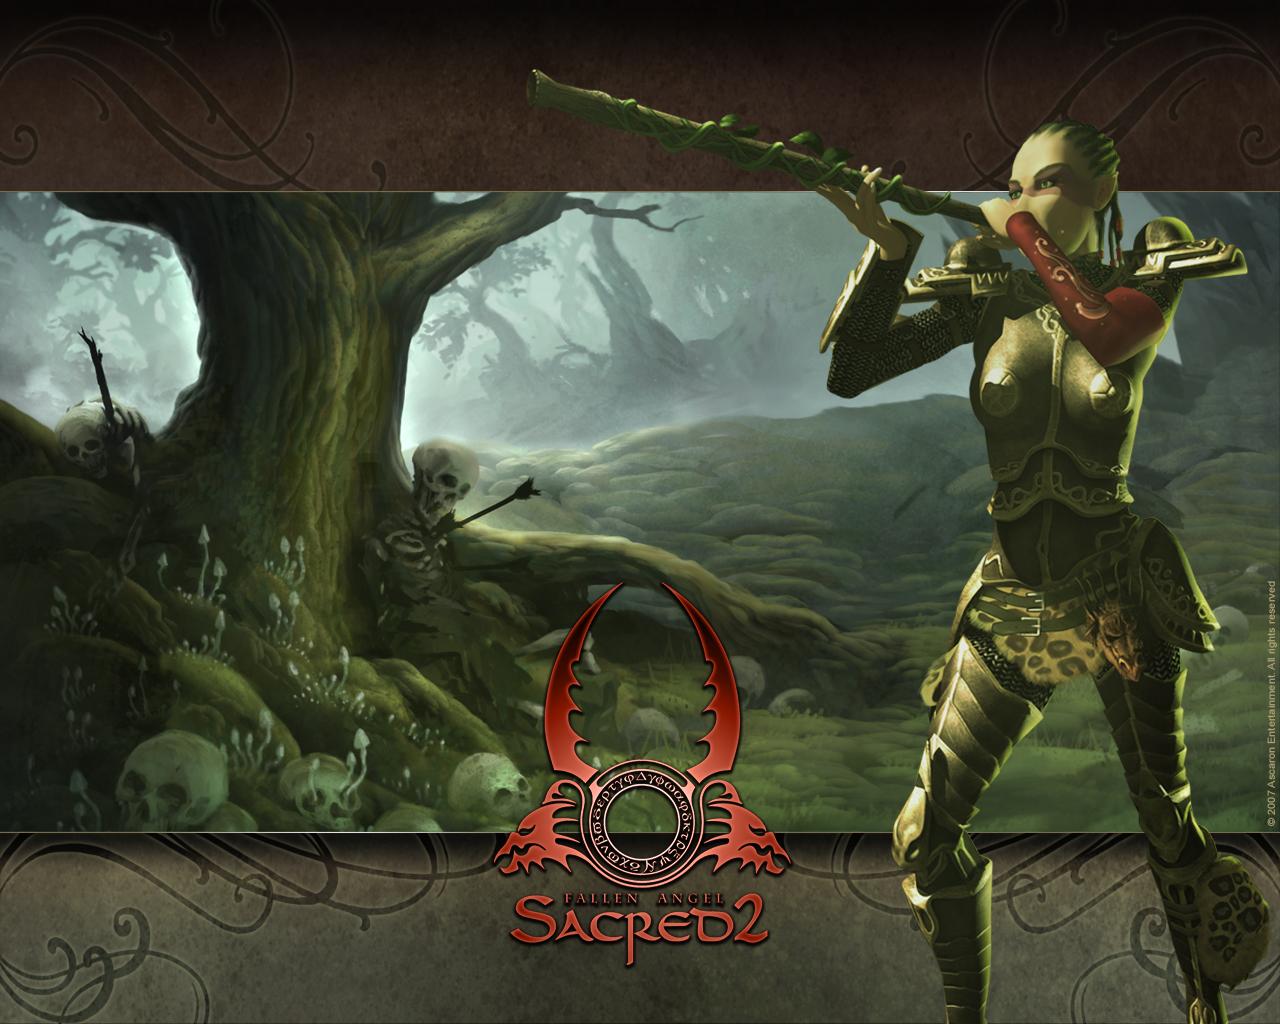 Sacred 2 Fallen Angel PC Wallpapers fonds dcran images 1280x1024